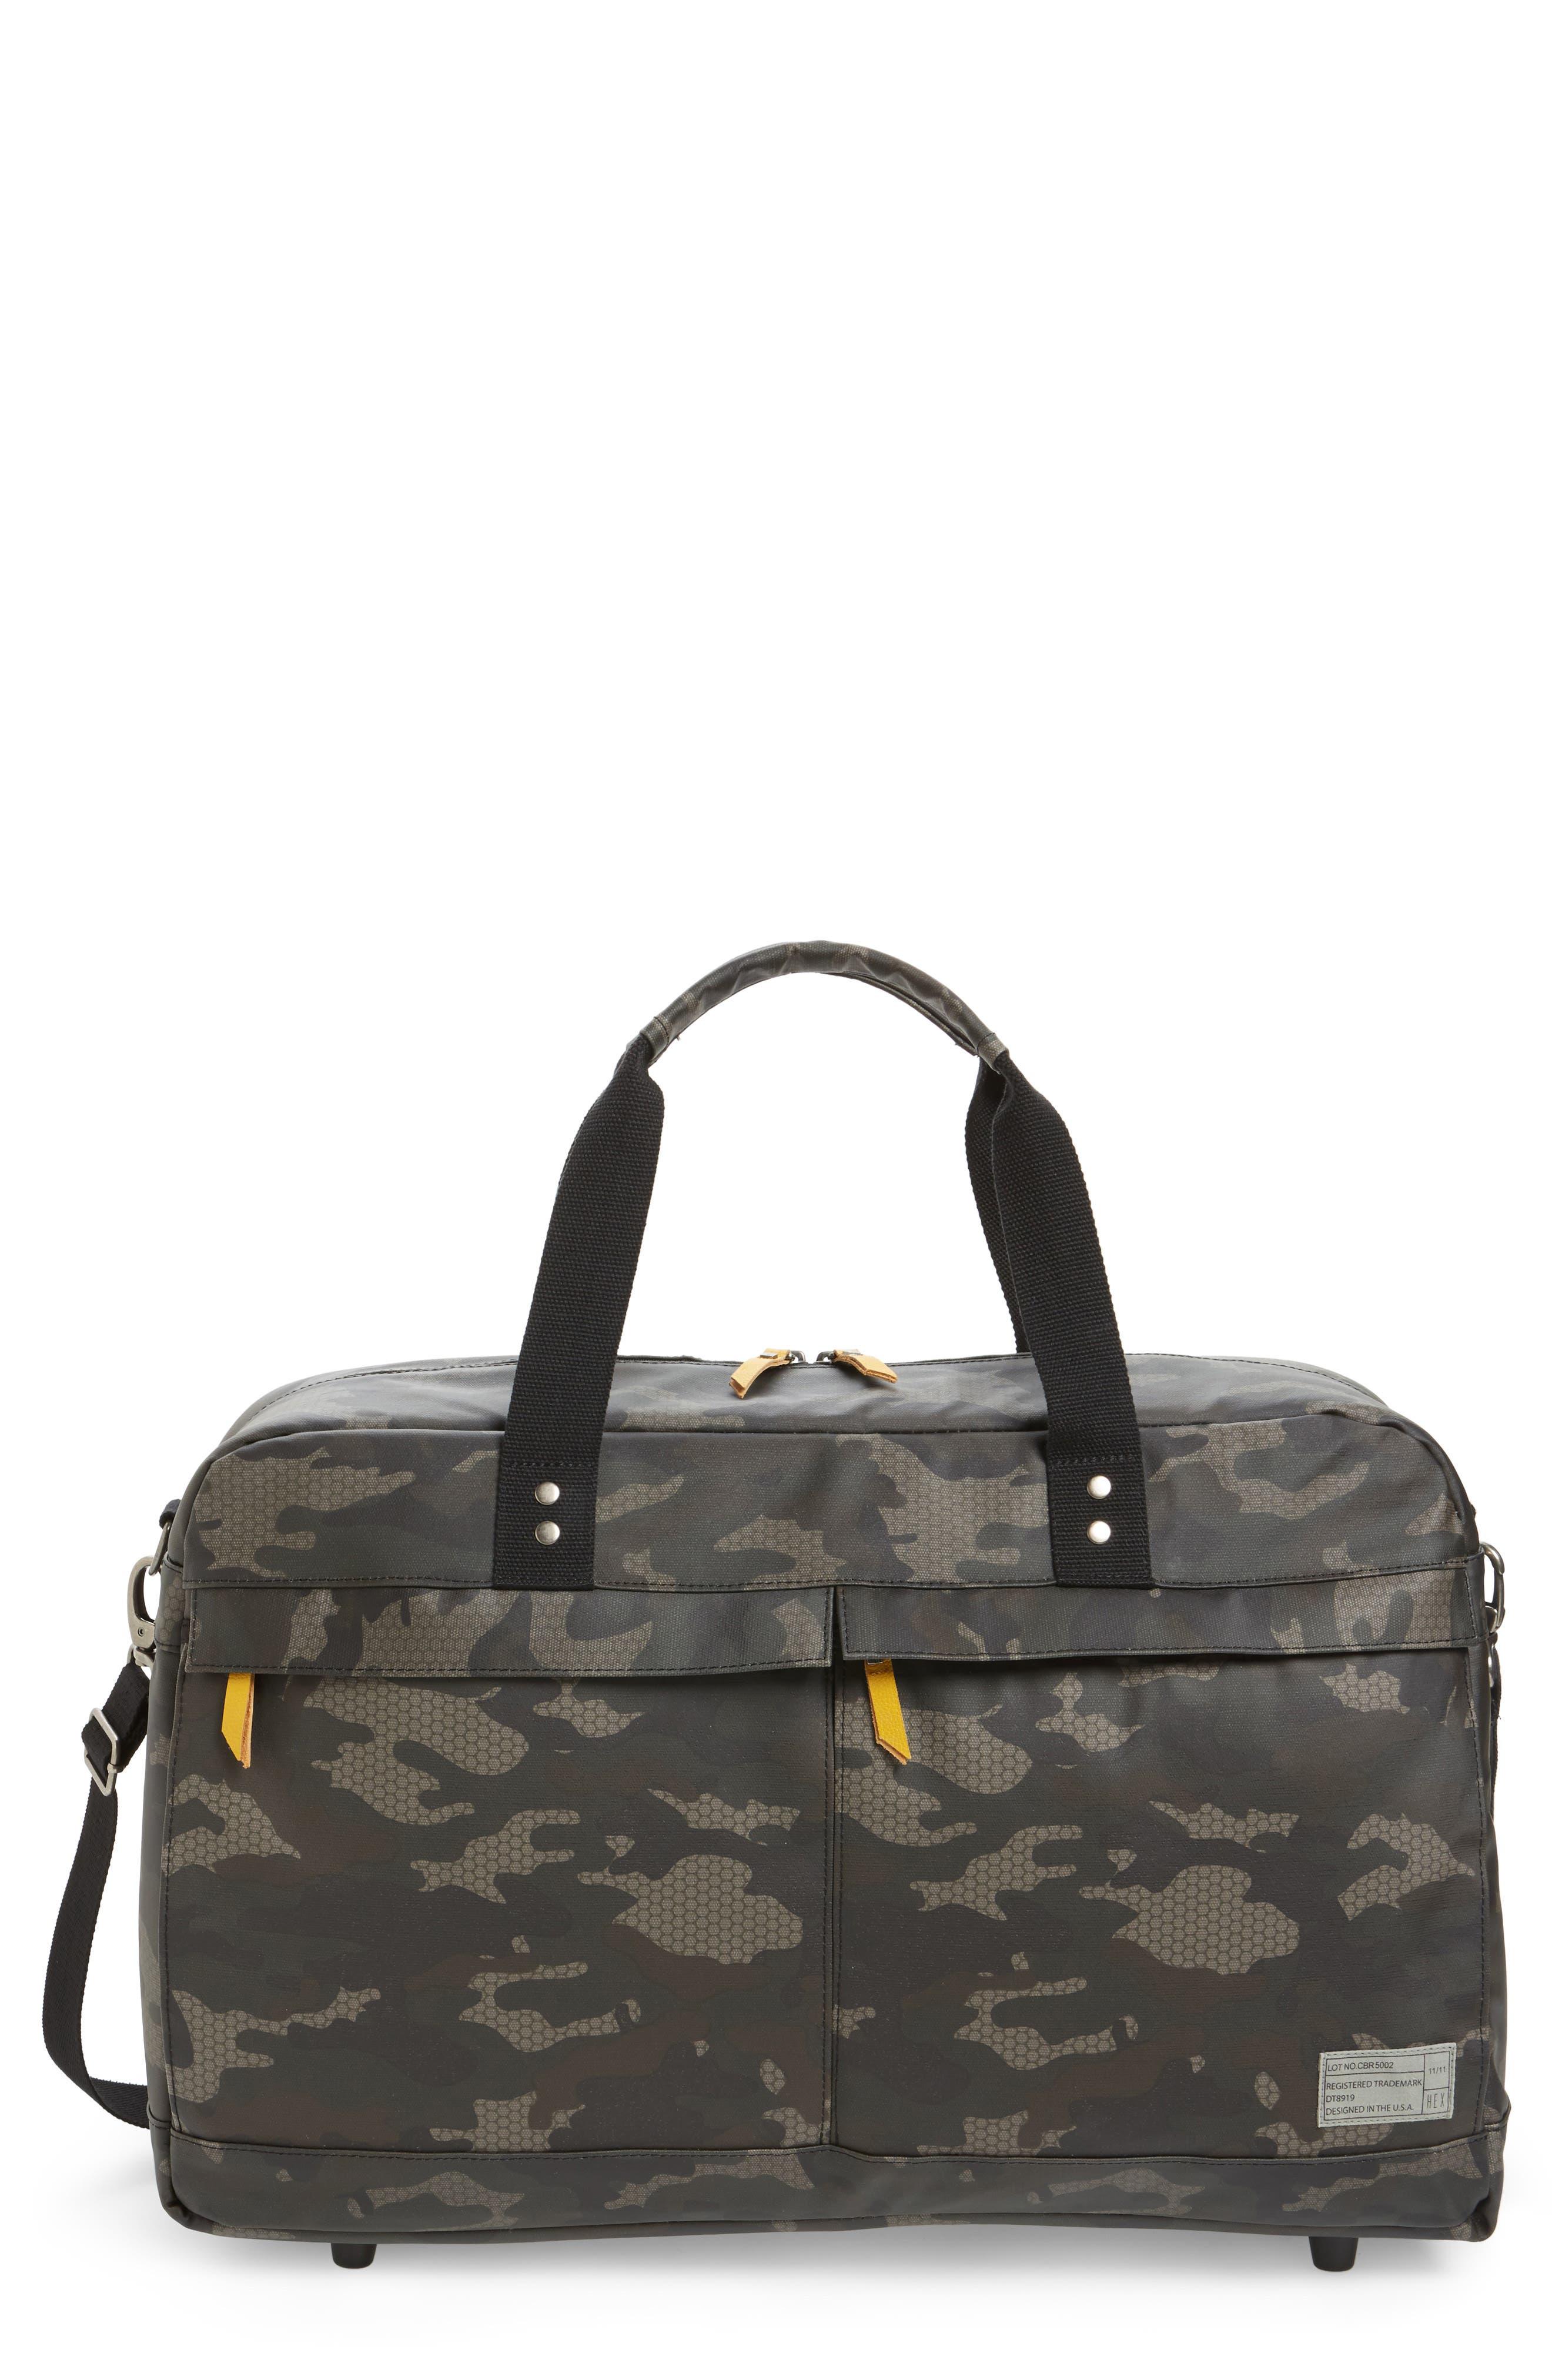 Calibre Duffel Bag,                             Main thumbnail 1, color,                             Camo